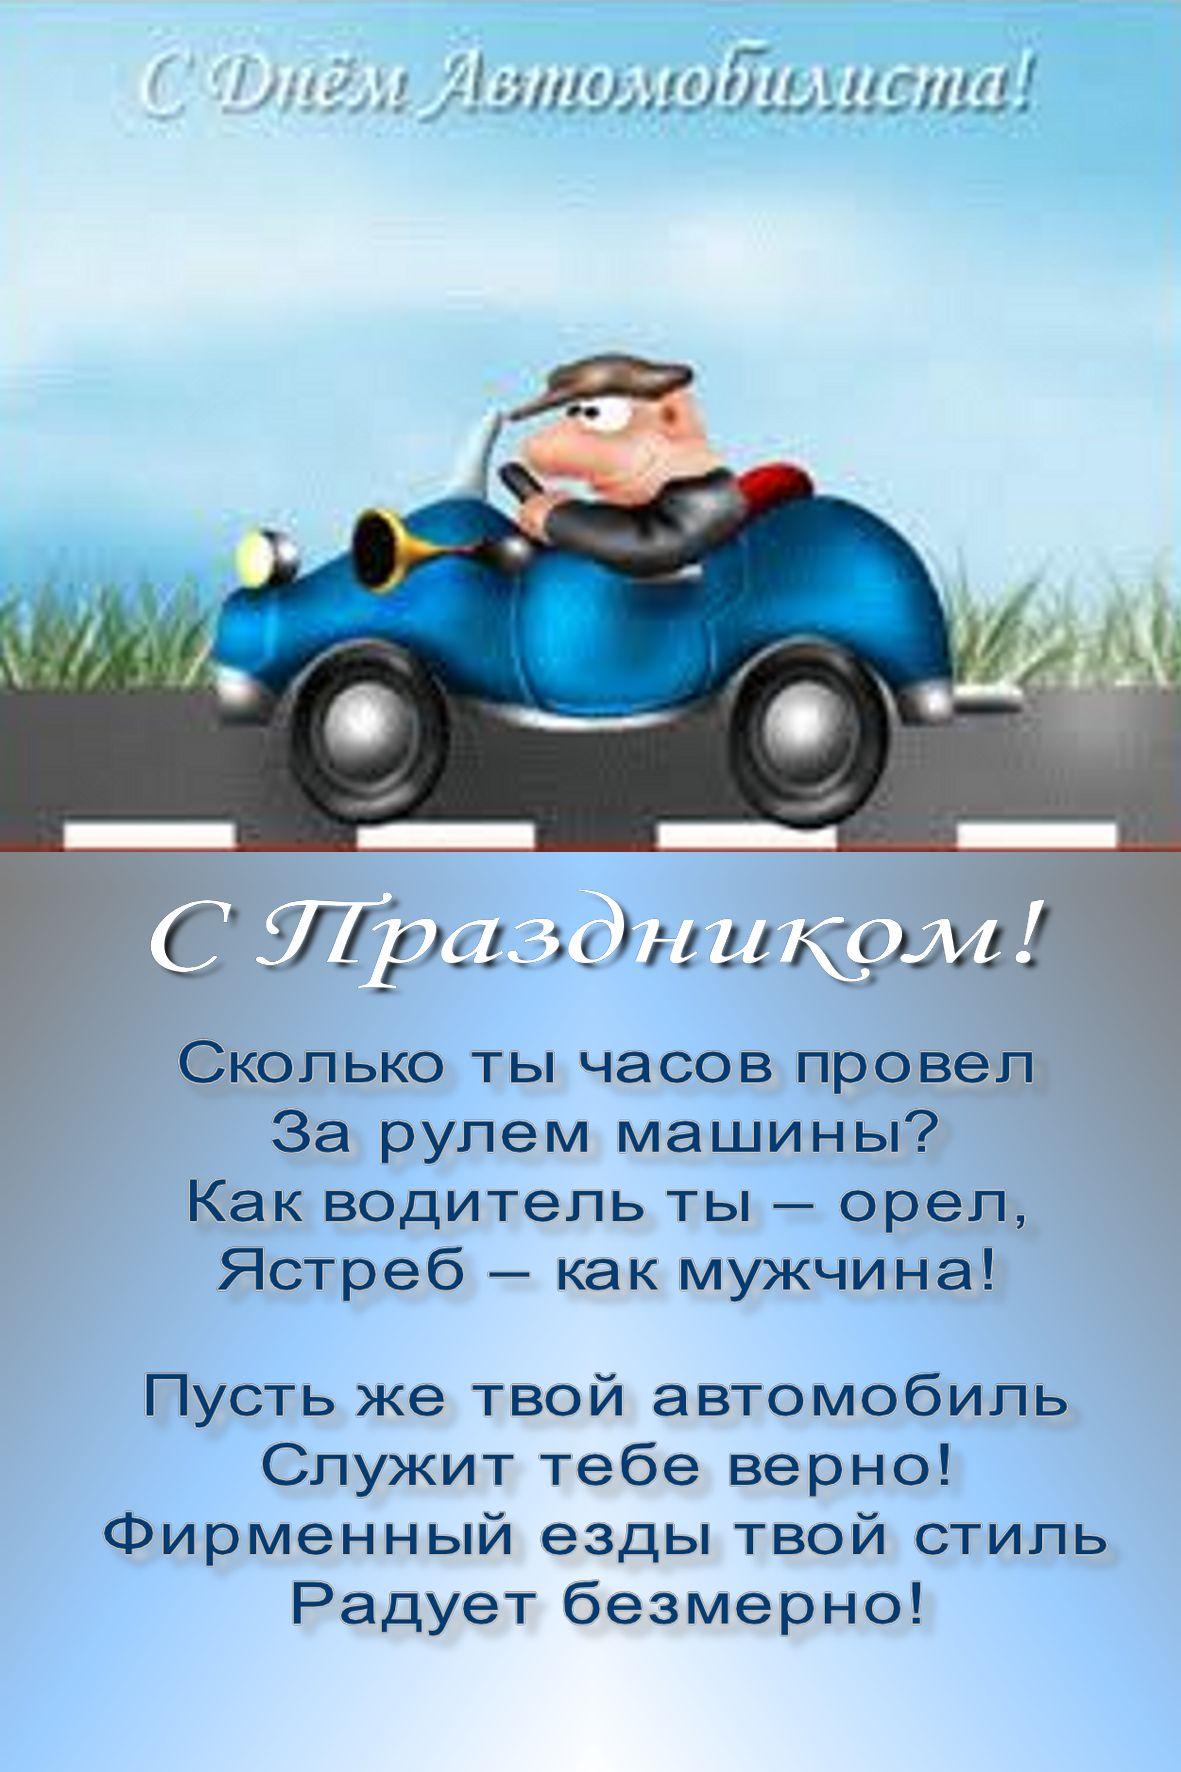 Молодому водителю поздравление с